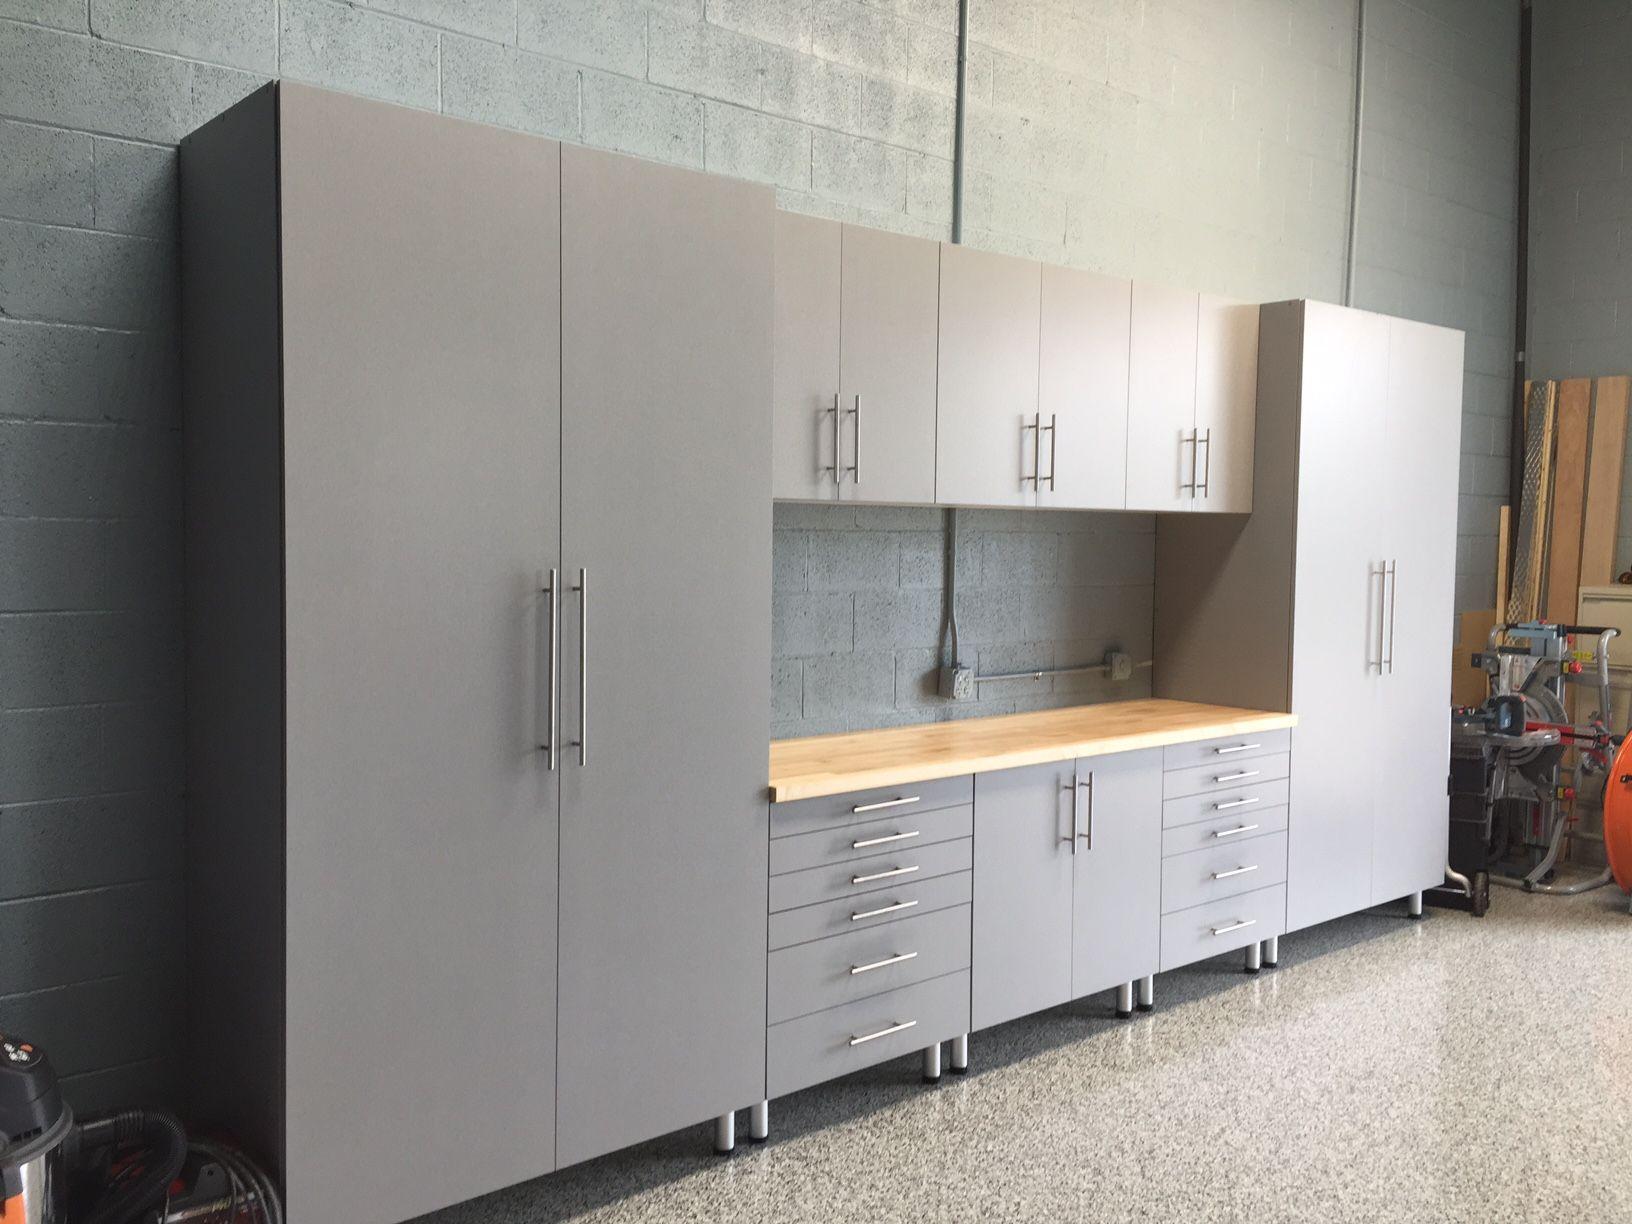 Custom butcher block workbench London Grey Cabinets epoxy floor